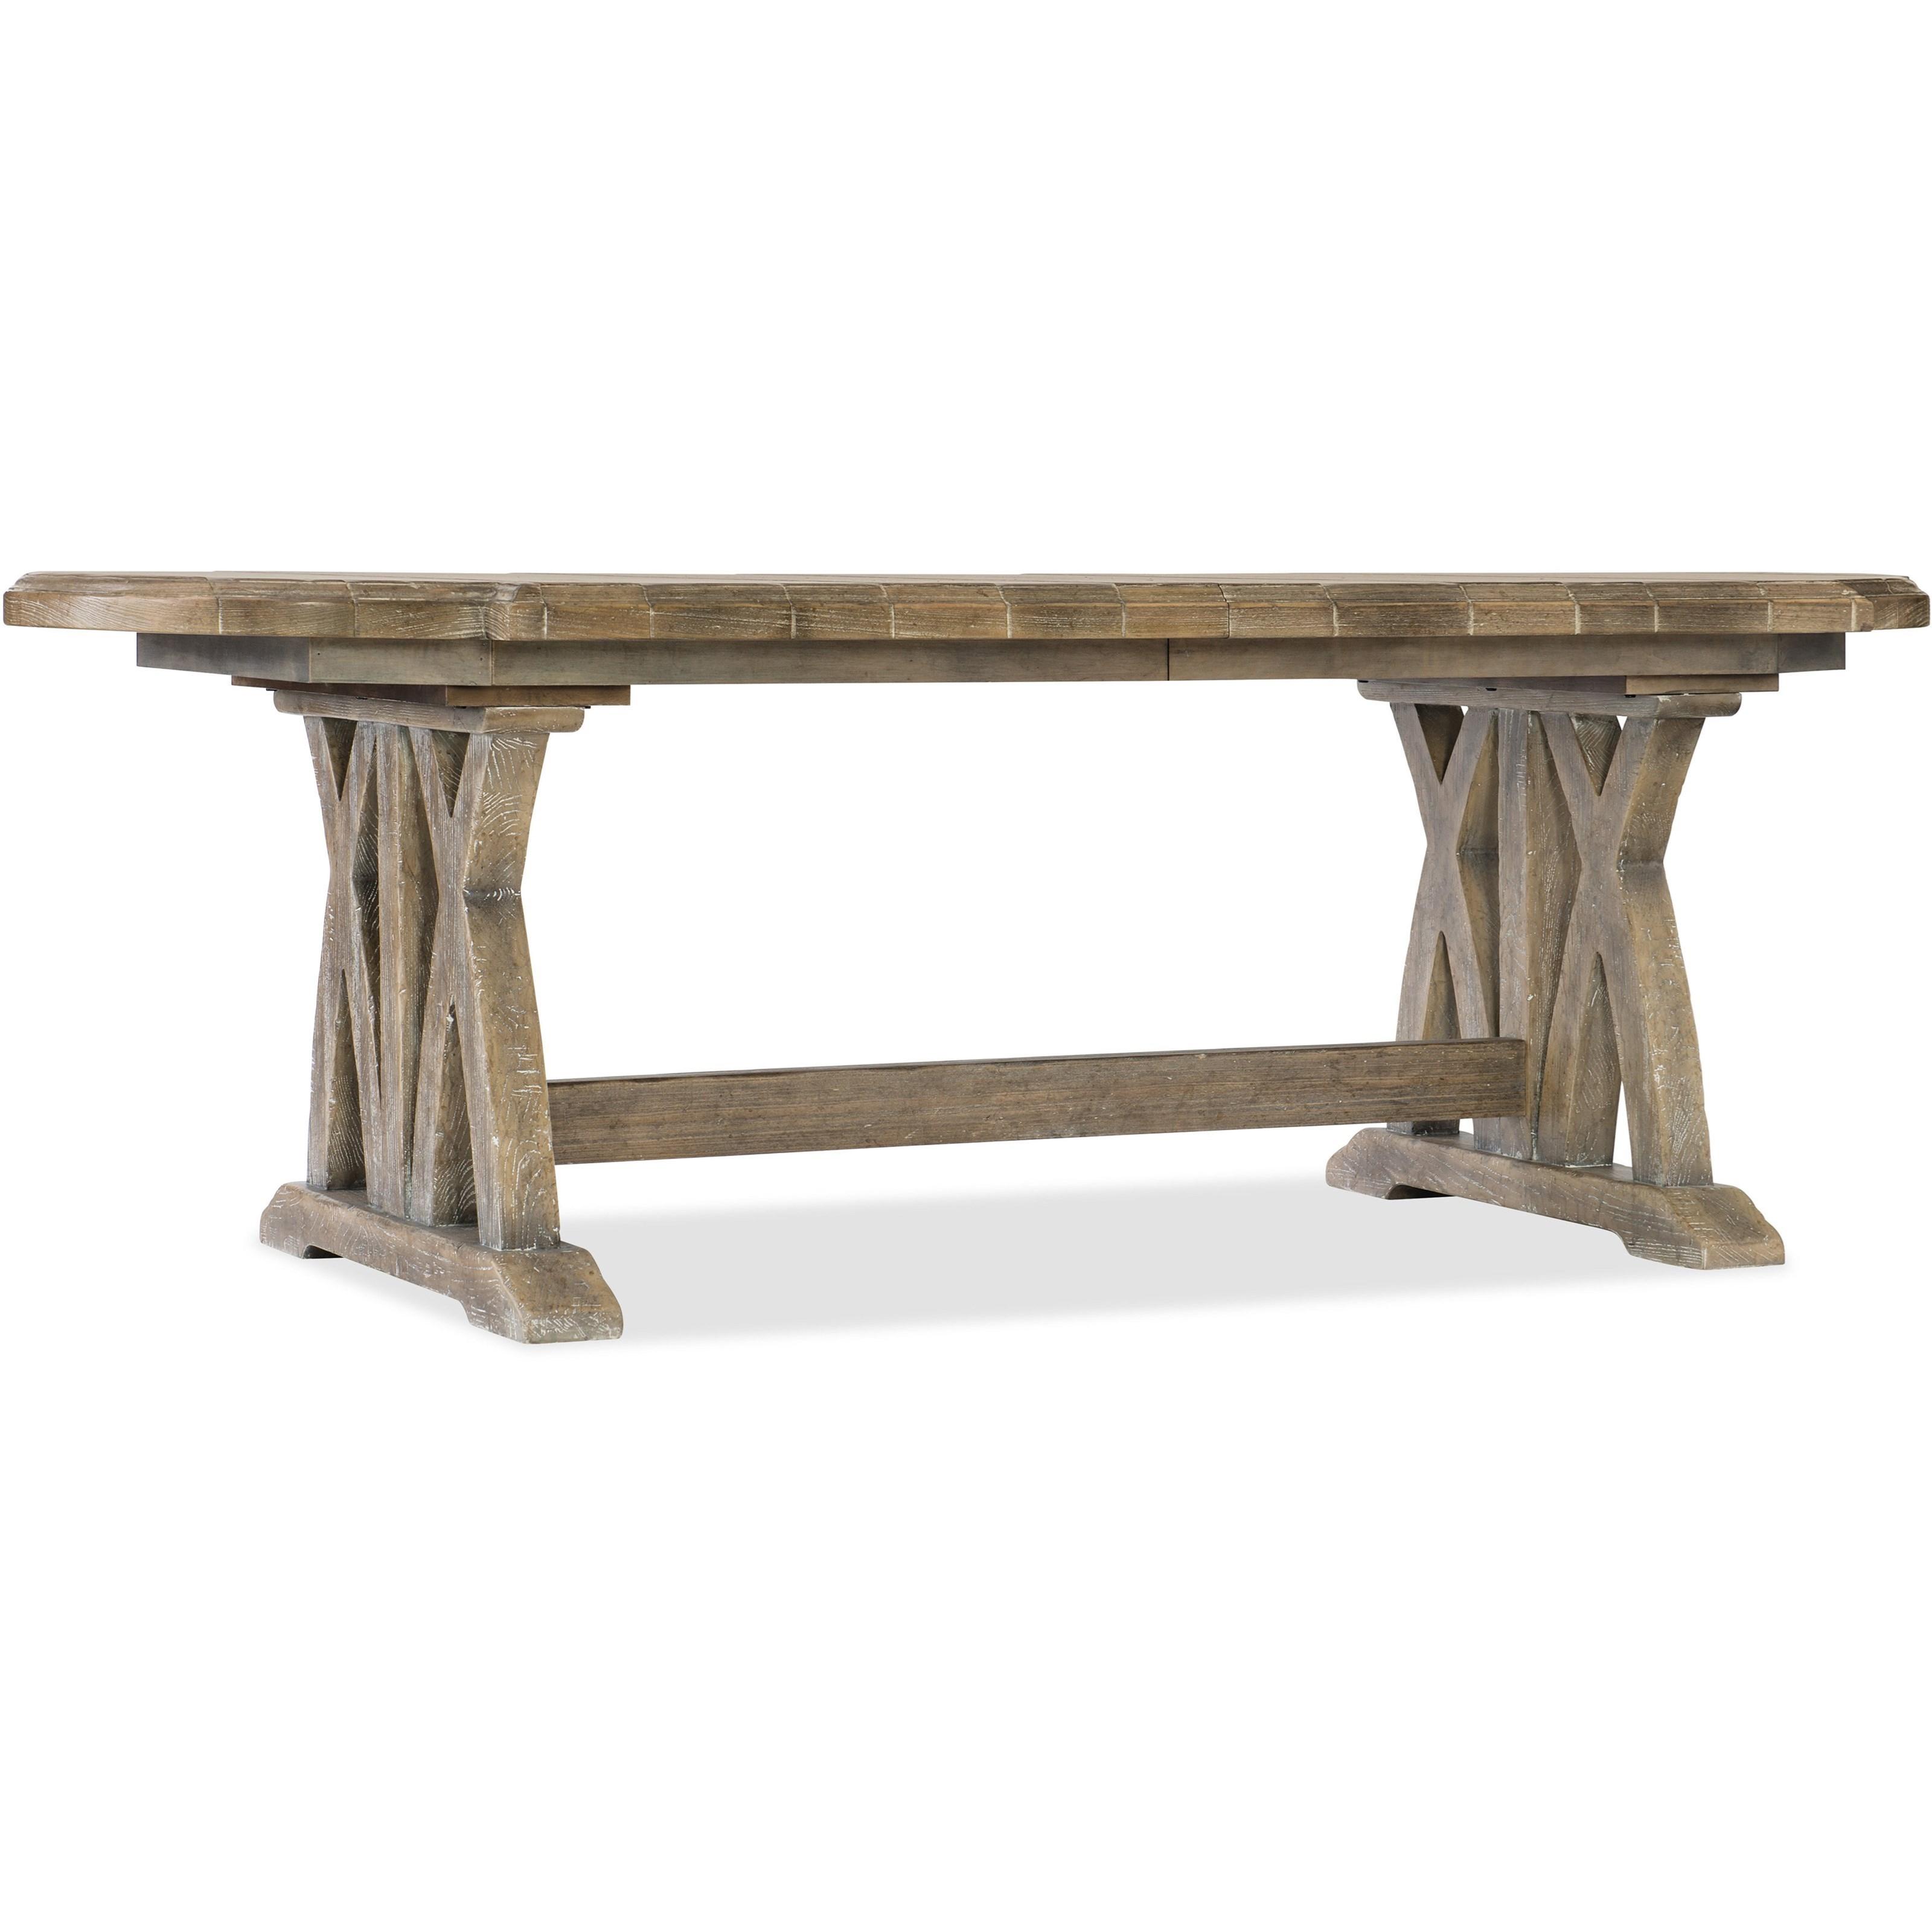 "Colibri 88"" Trestle Dining Table w/1-20in Leaf"